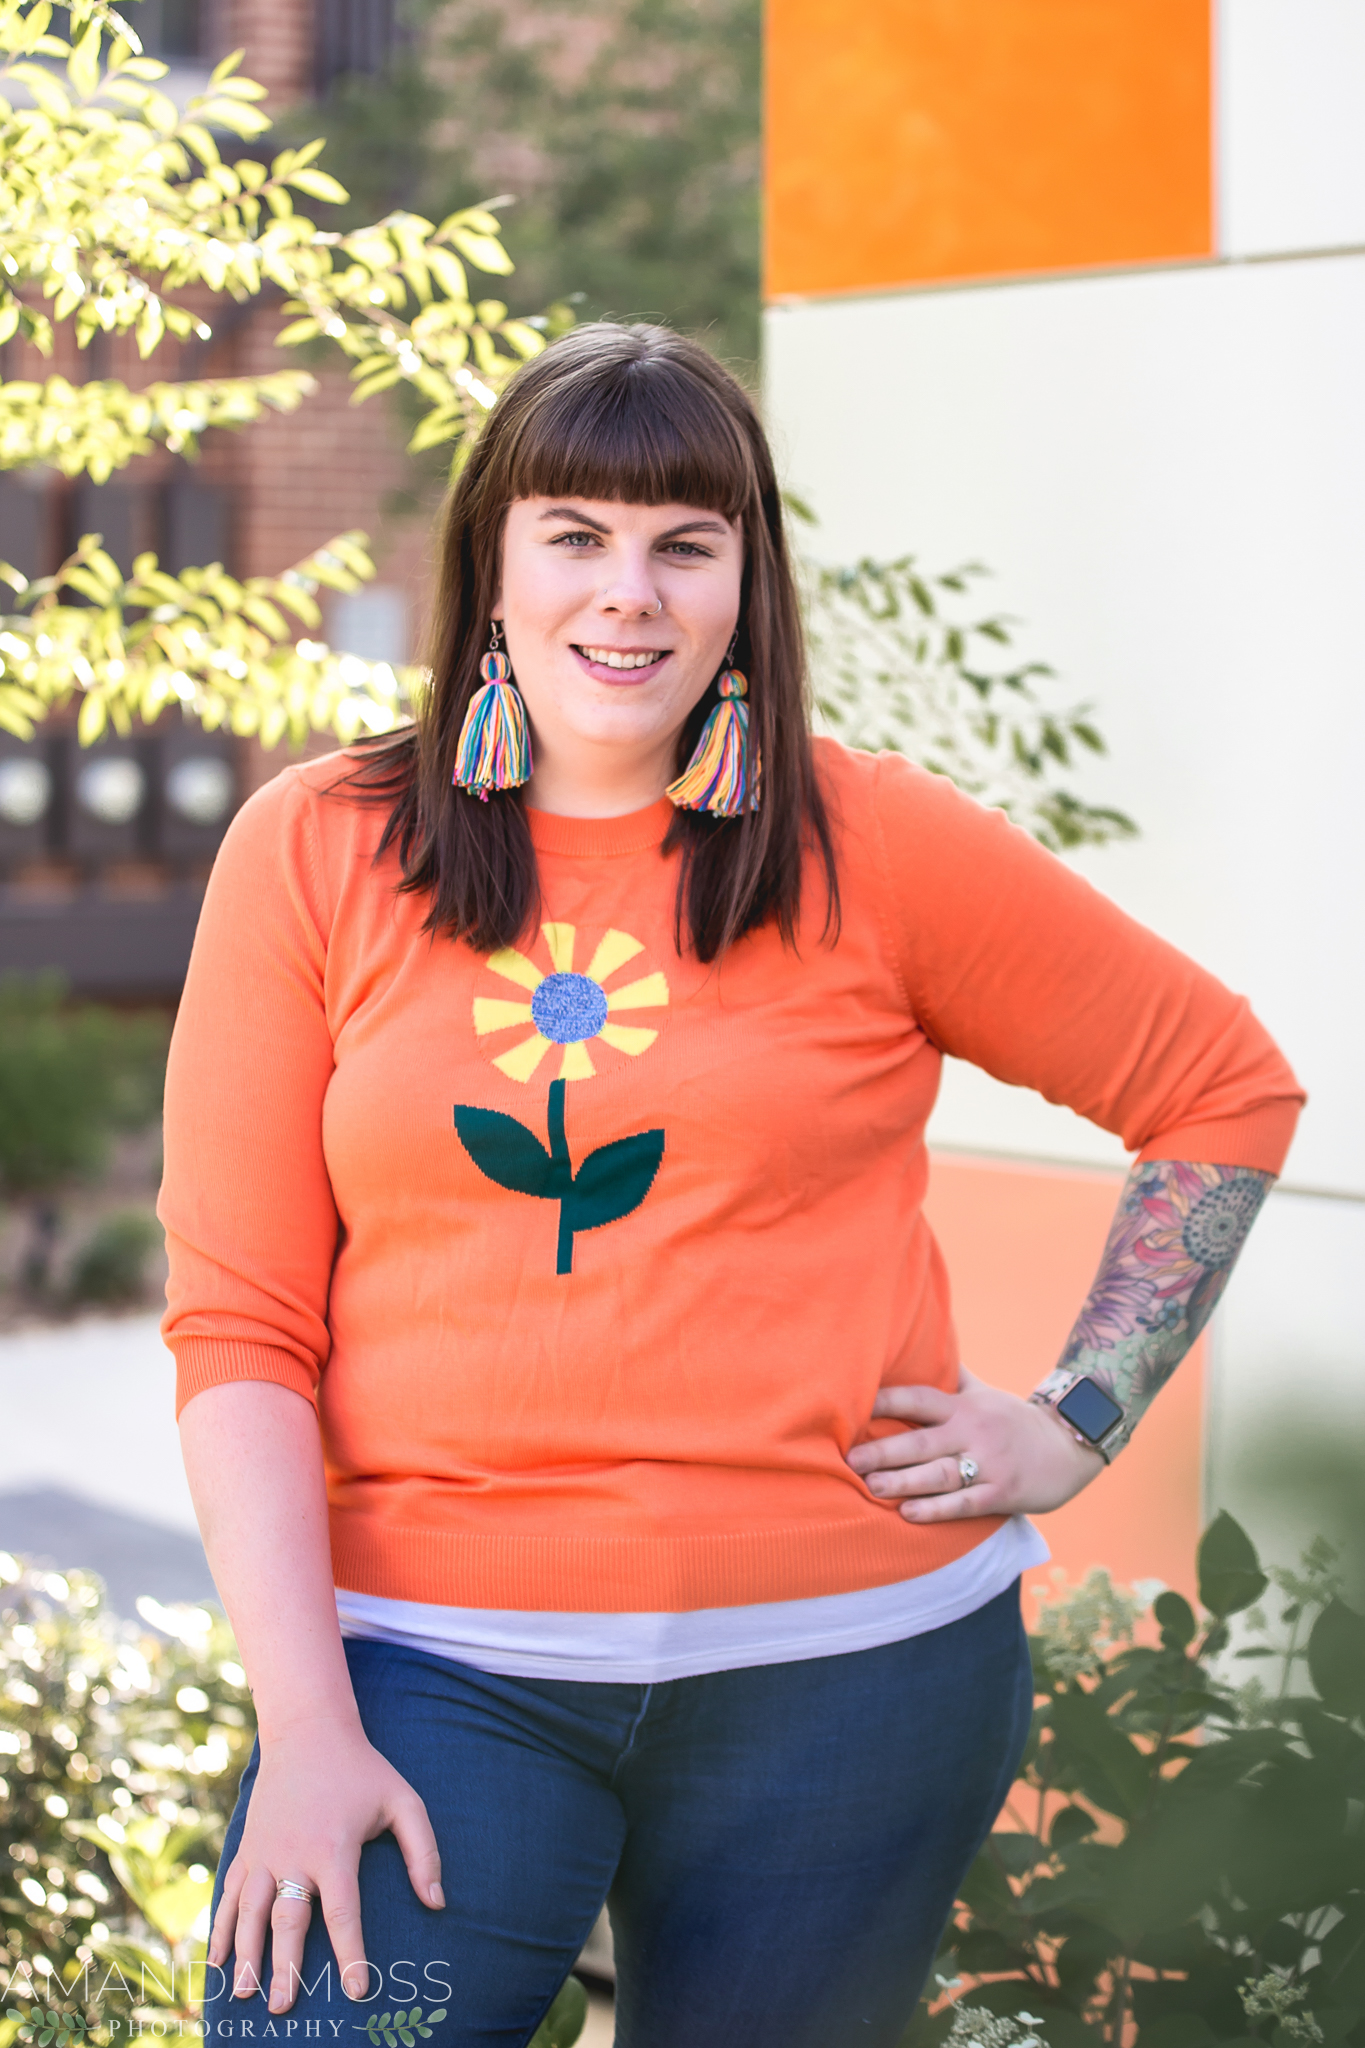 charlotte north carolina headshot branding portrait photographer south end noda fun silly confetti hearts wall